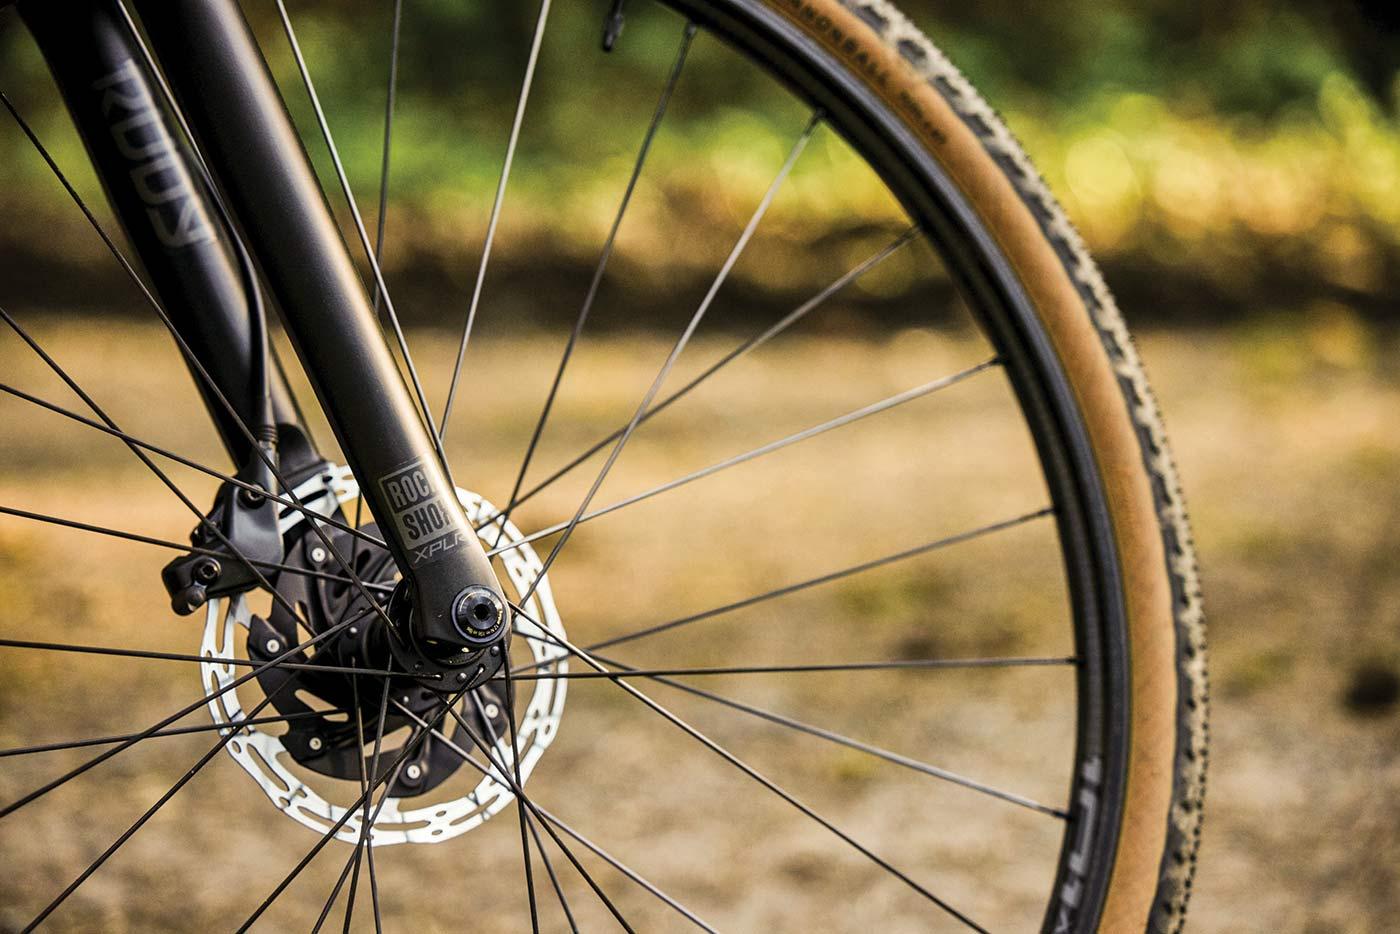 side view of 2022 rockshox rudy suspension fork for gravel bikes